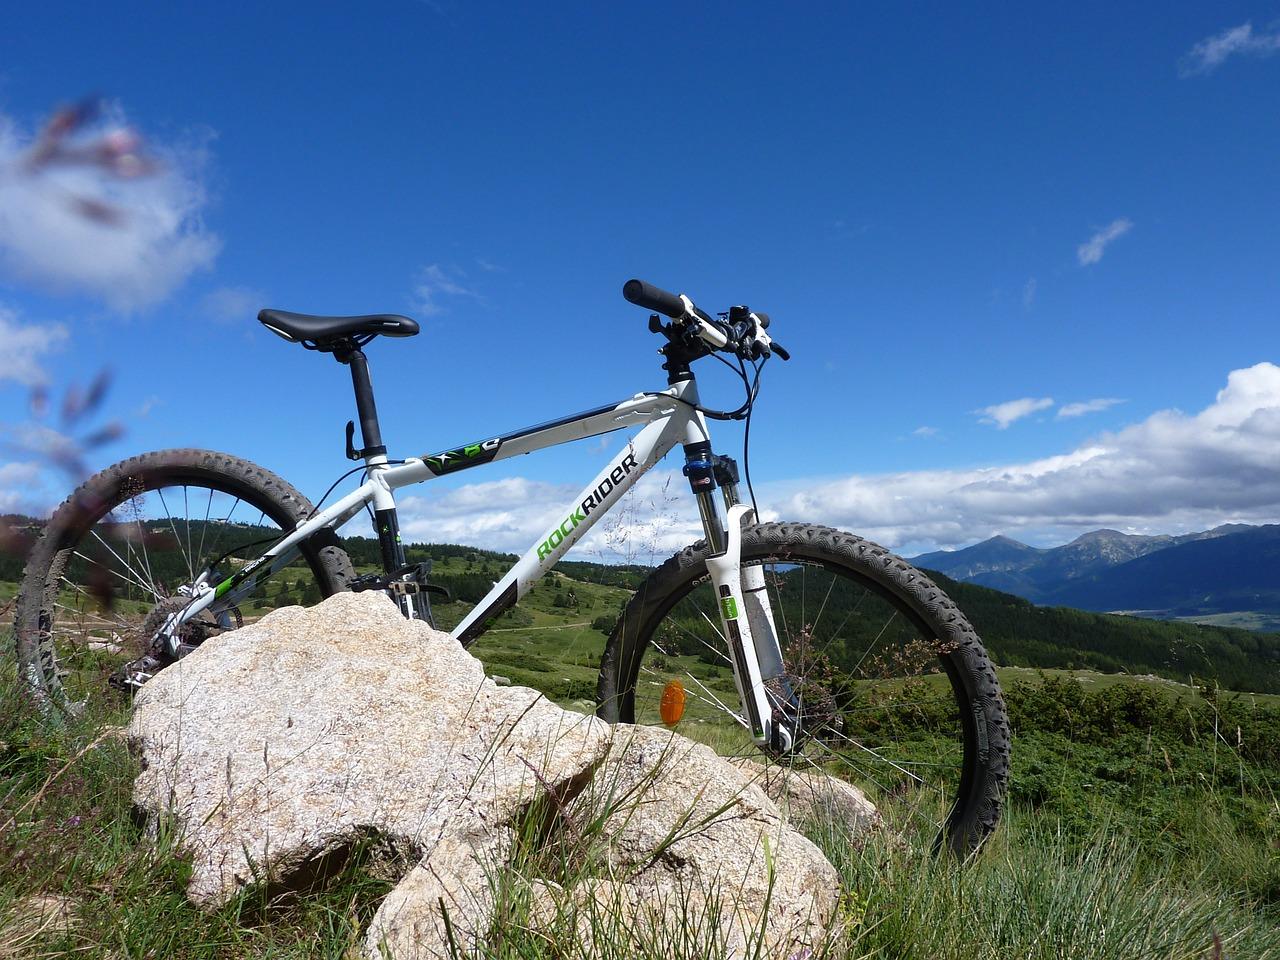 mountain-biking-598506_1280